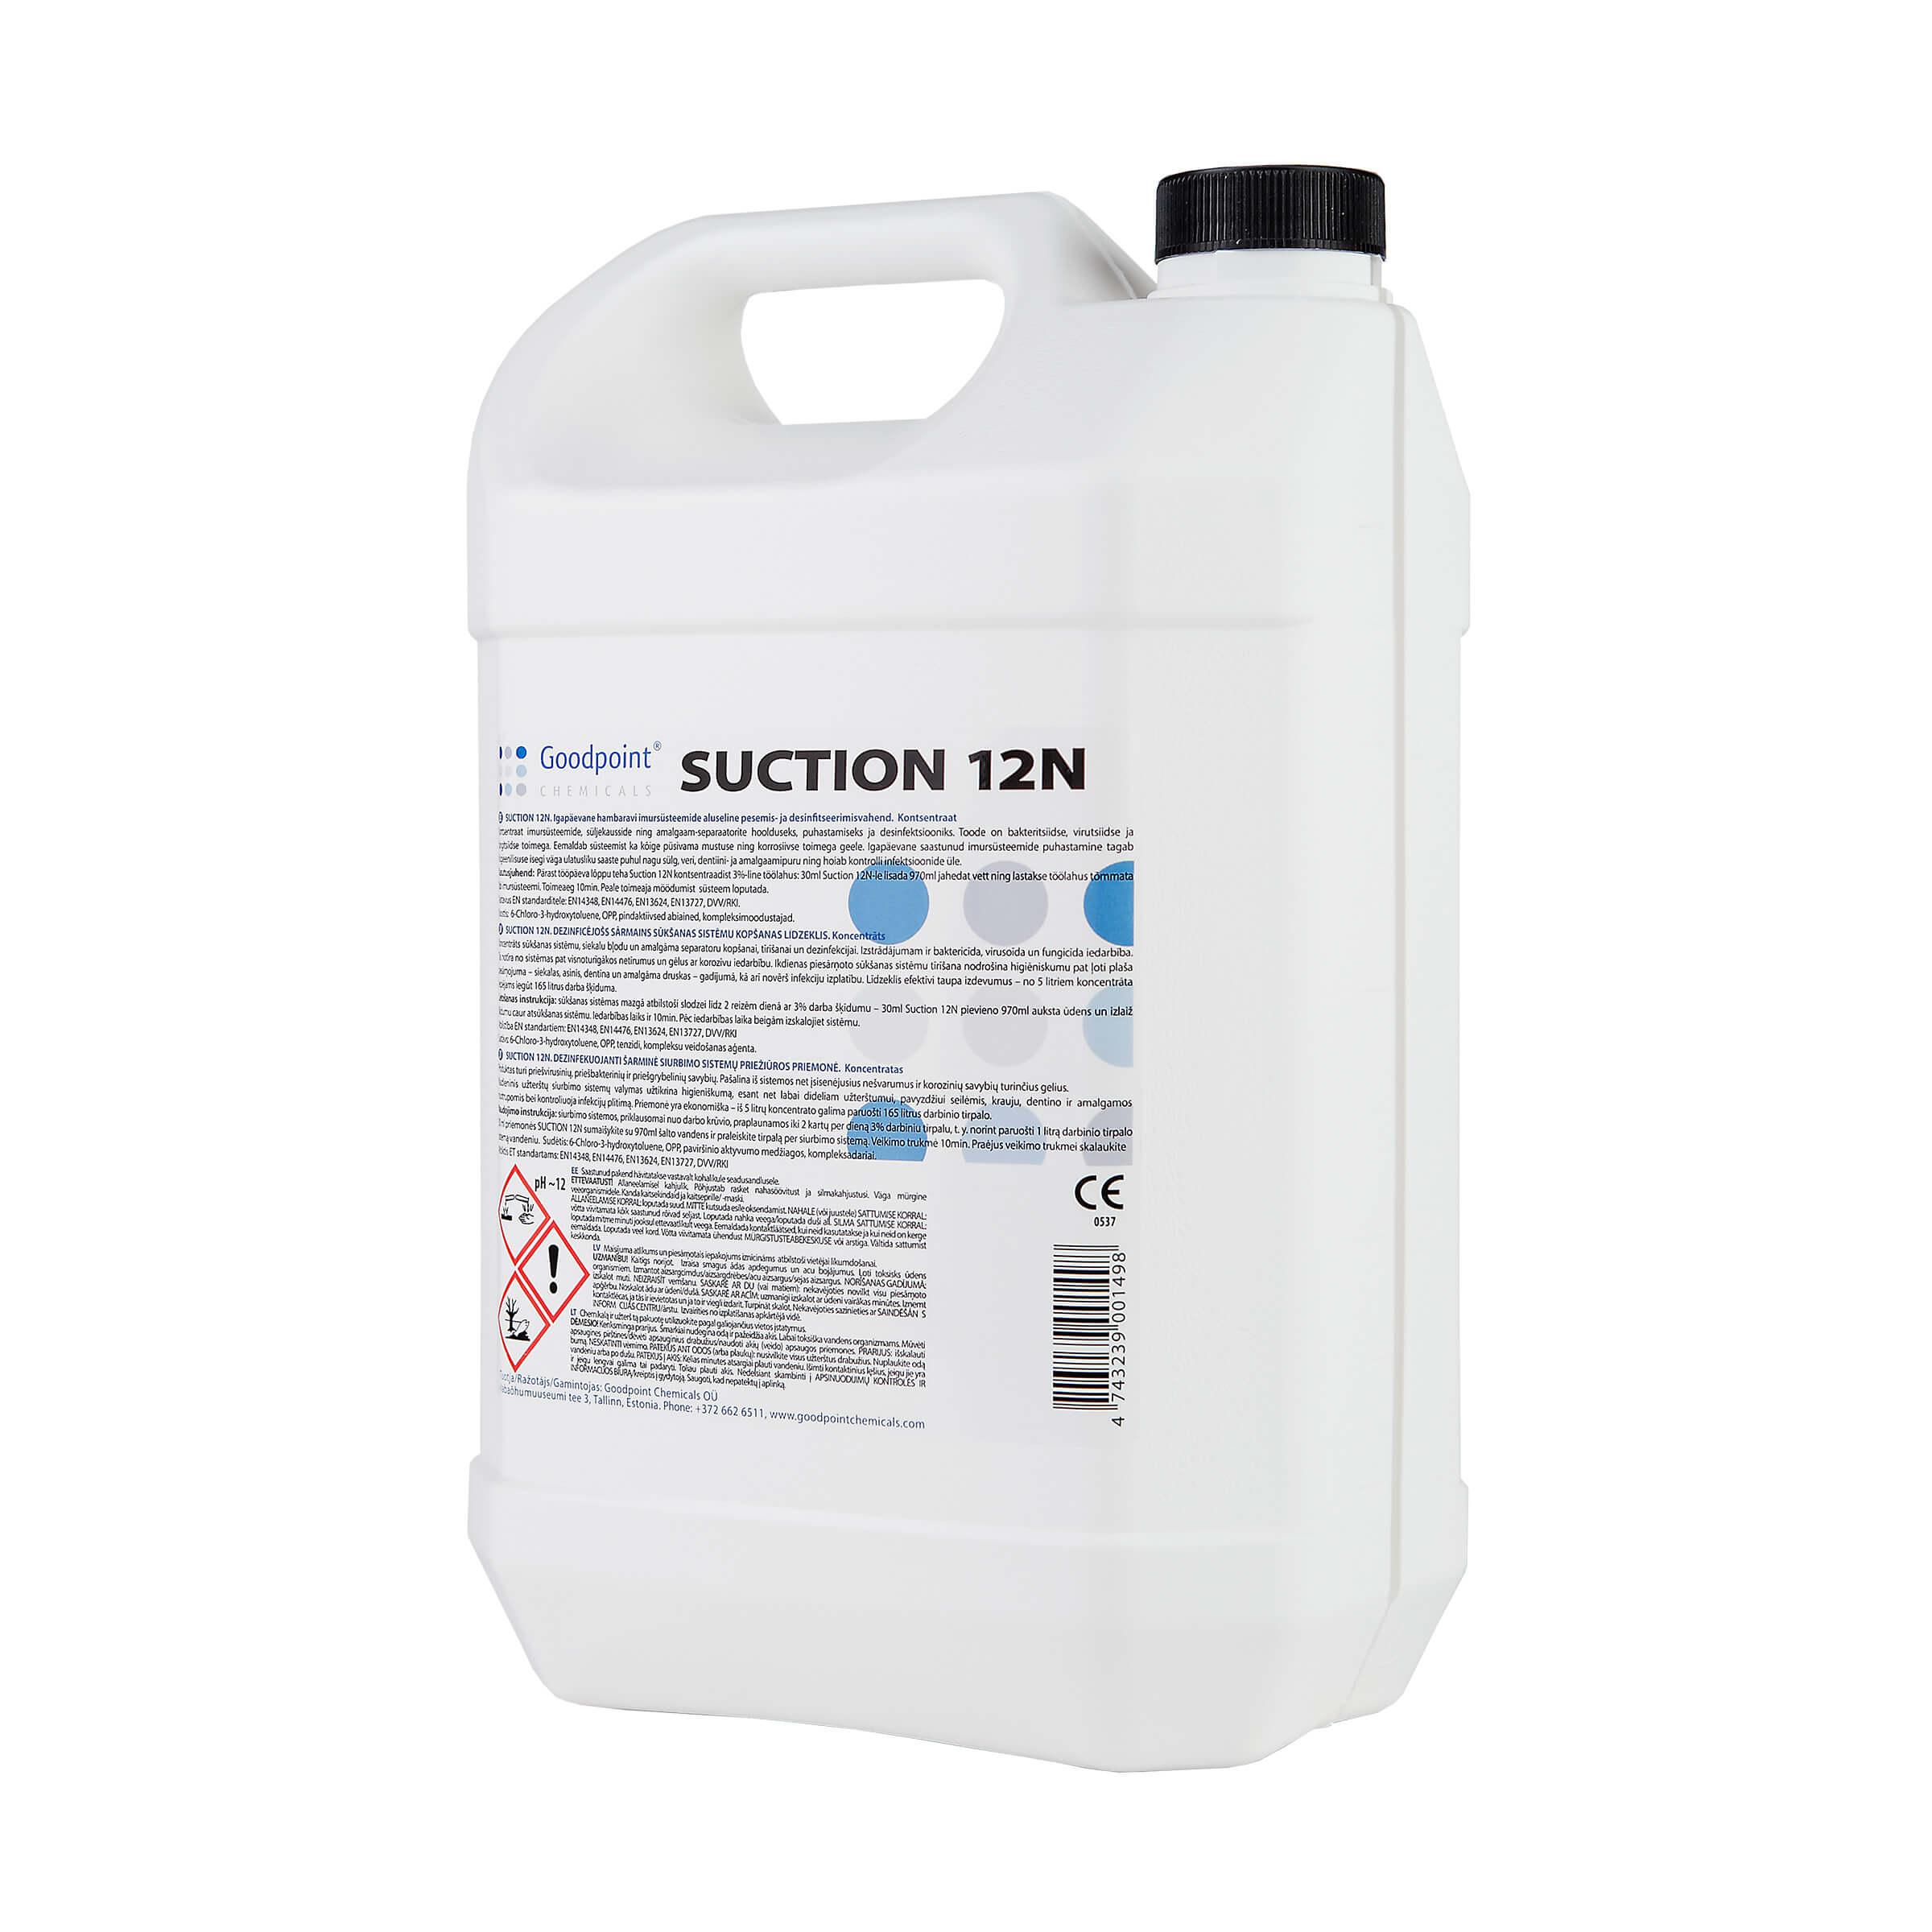 5l kanister suction 12n goodpoint chemicals. Black Bedroom Furniture Sets. Home Design Ideas